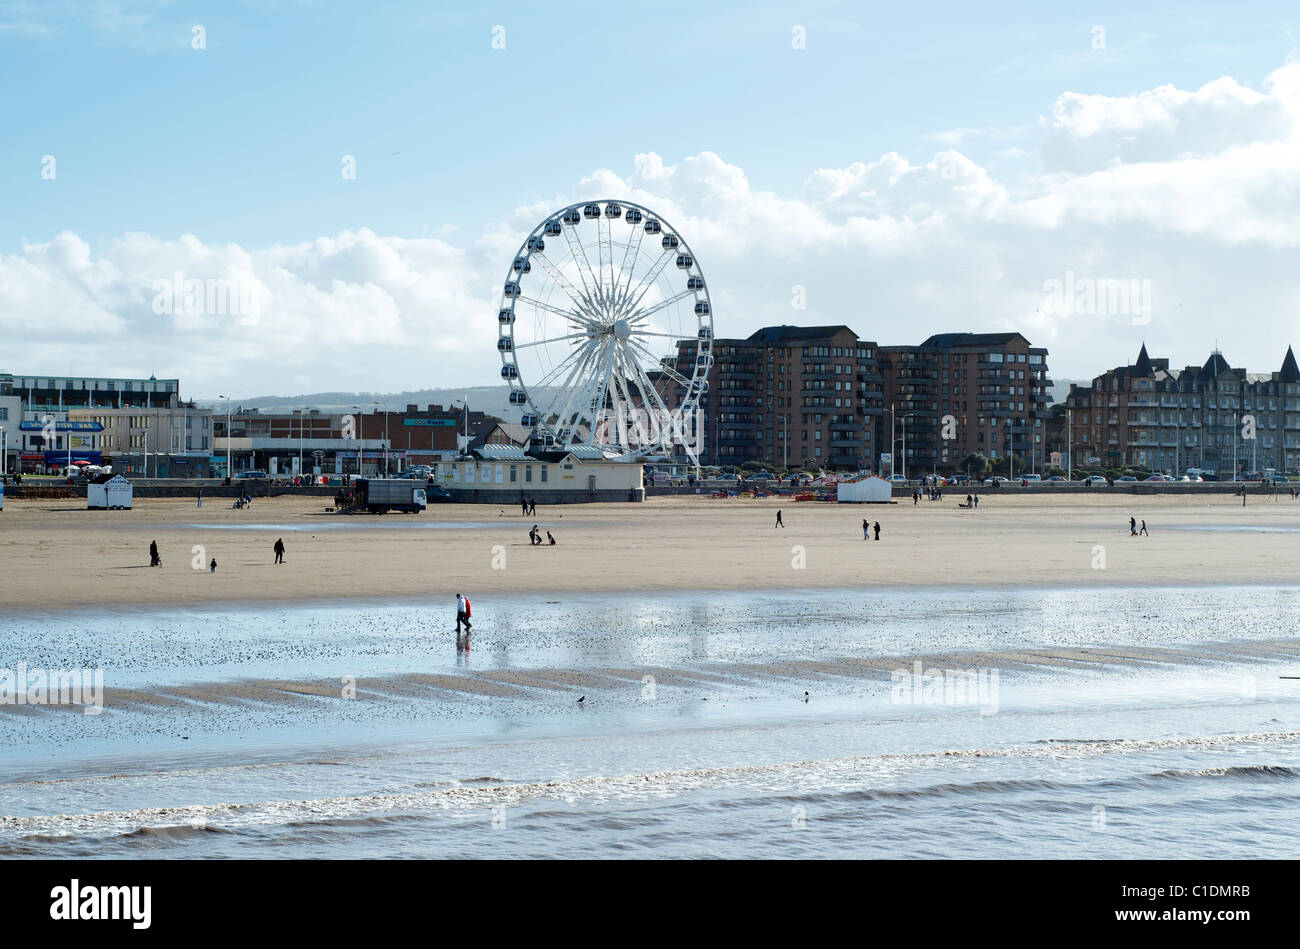 Weston Super Mare beach and wheel somerset England - Stock Image